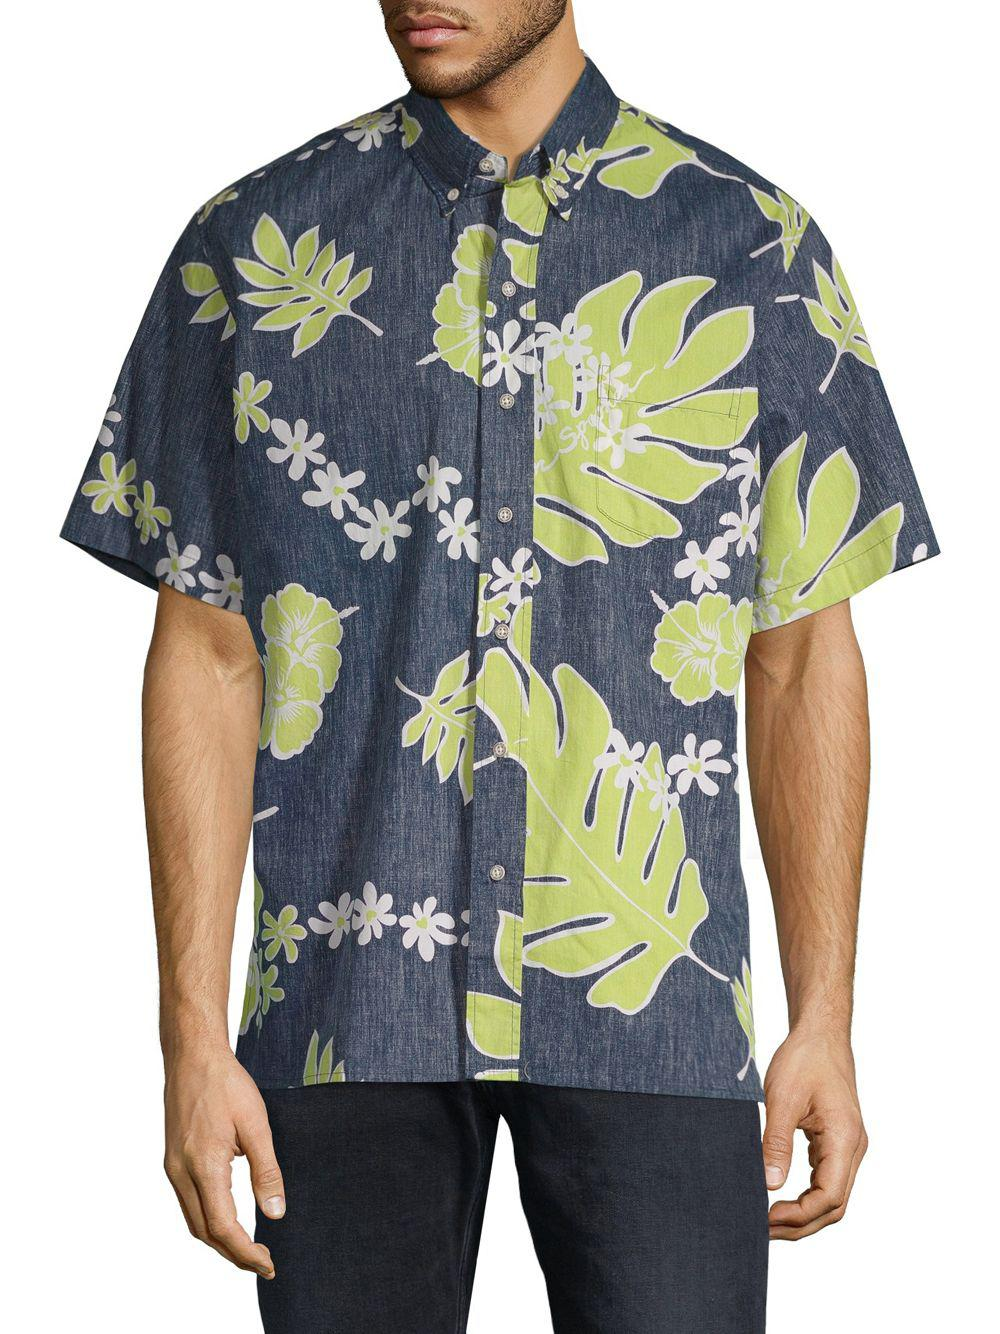 0cc722550 Lyst - Reyn Spooner Old School Cotton Button-down Shirt in Blue for Men